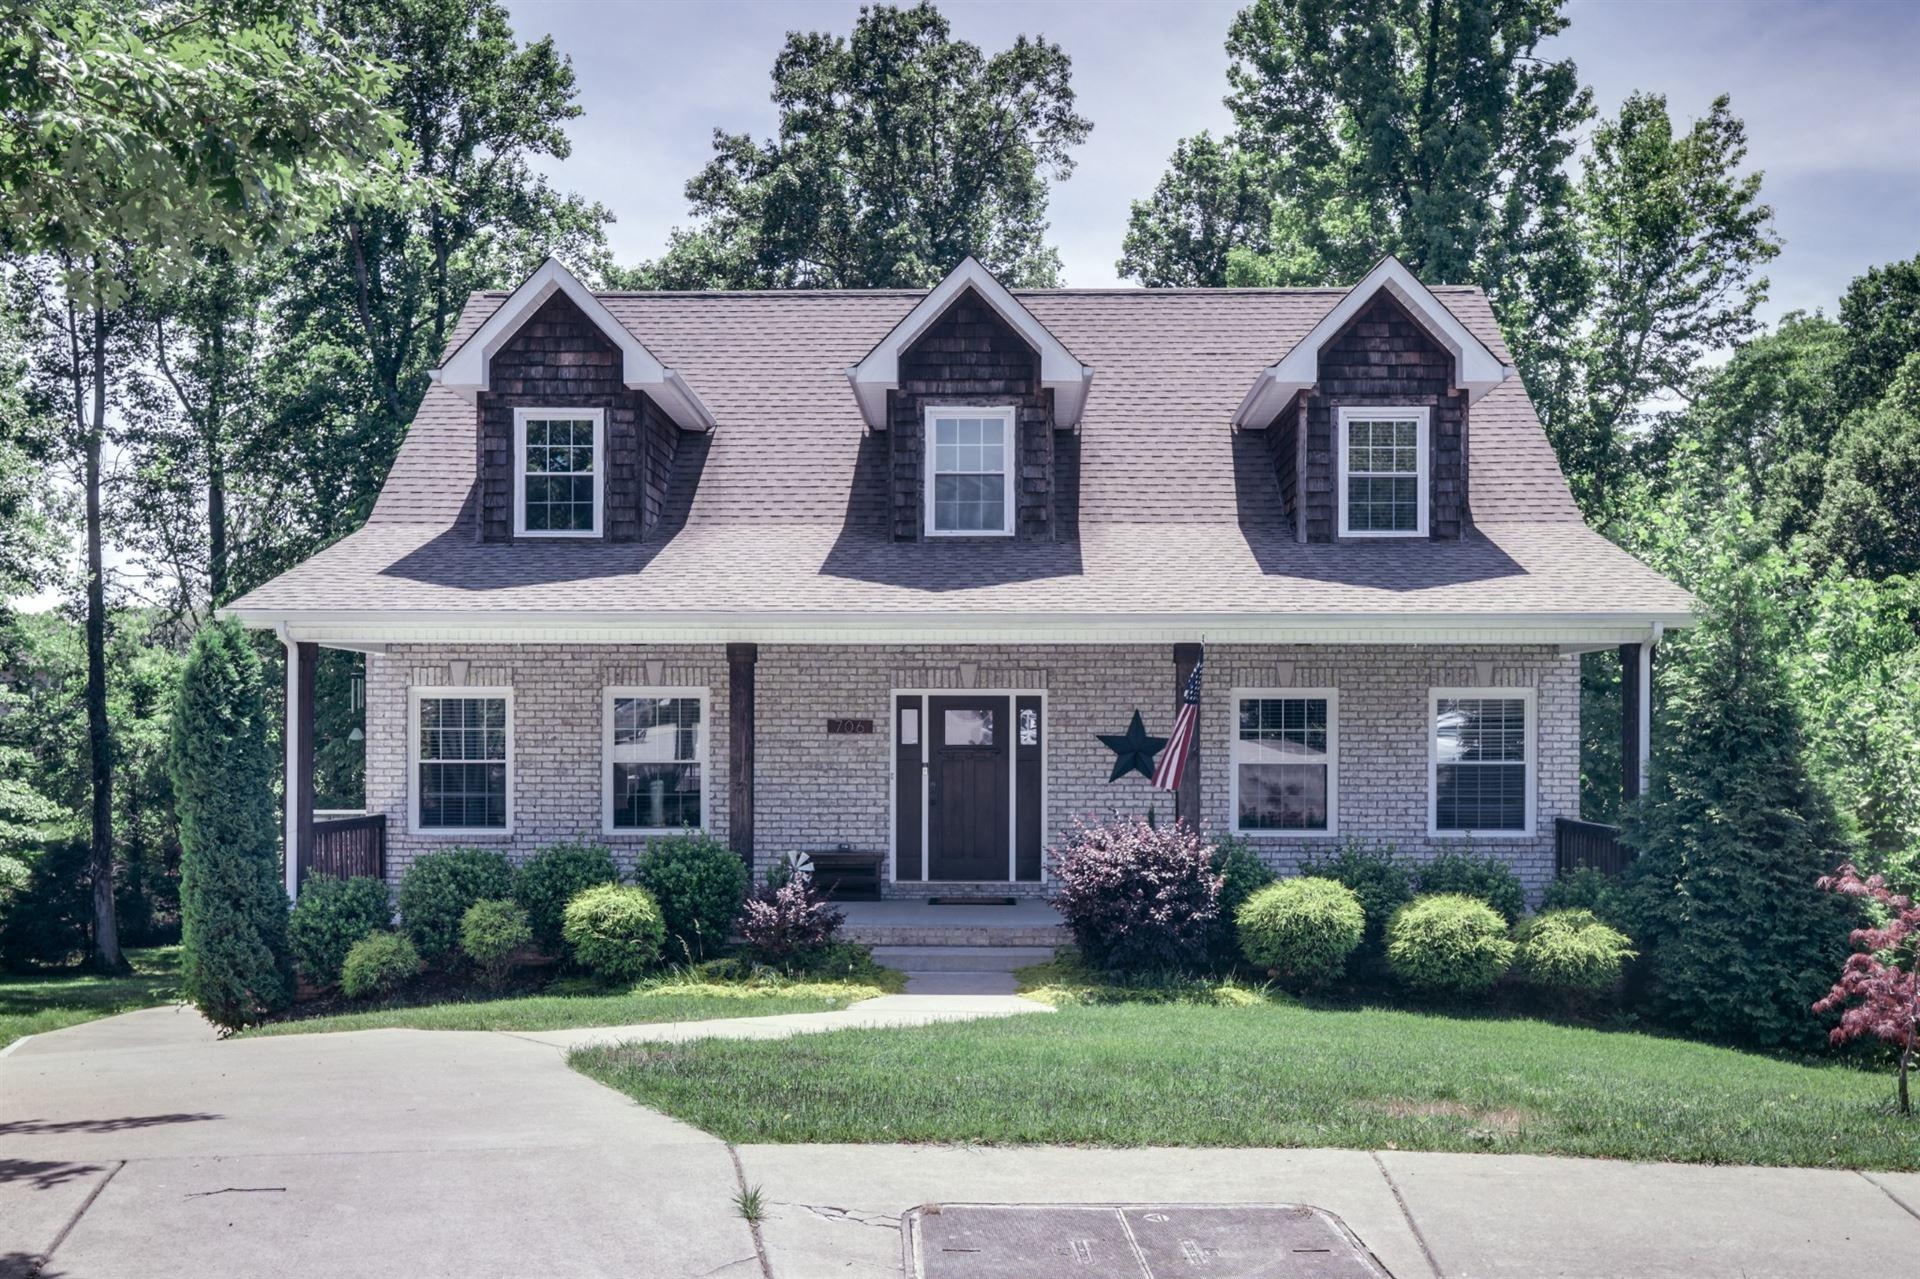 706 Courtland Ave, Clarksville, TN 37043 - MLS#: 2258786